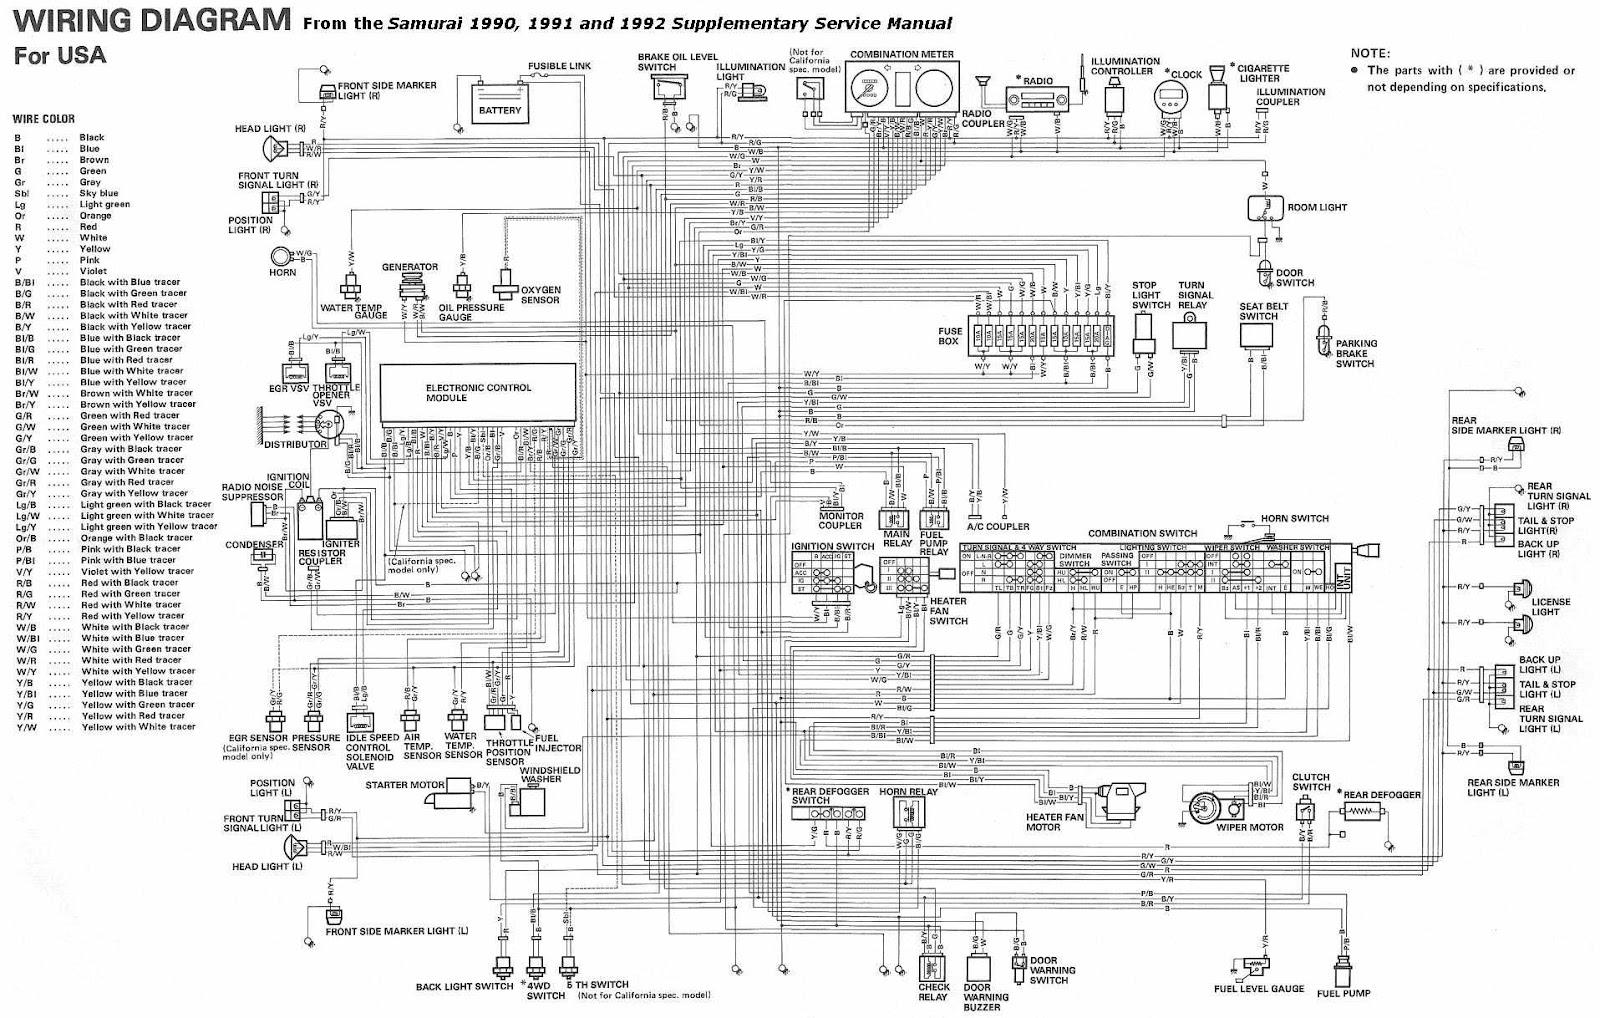 Fabulous Daihatsu Ac Wiring Diagram Wiring Diagram Wiring Cloud Loplapiotaidewilluminateatxorg